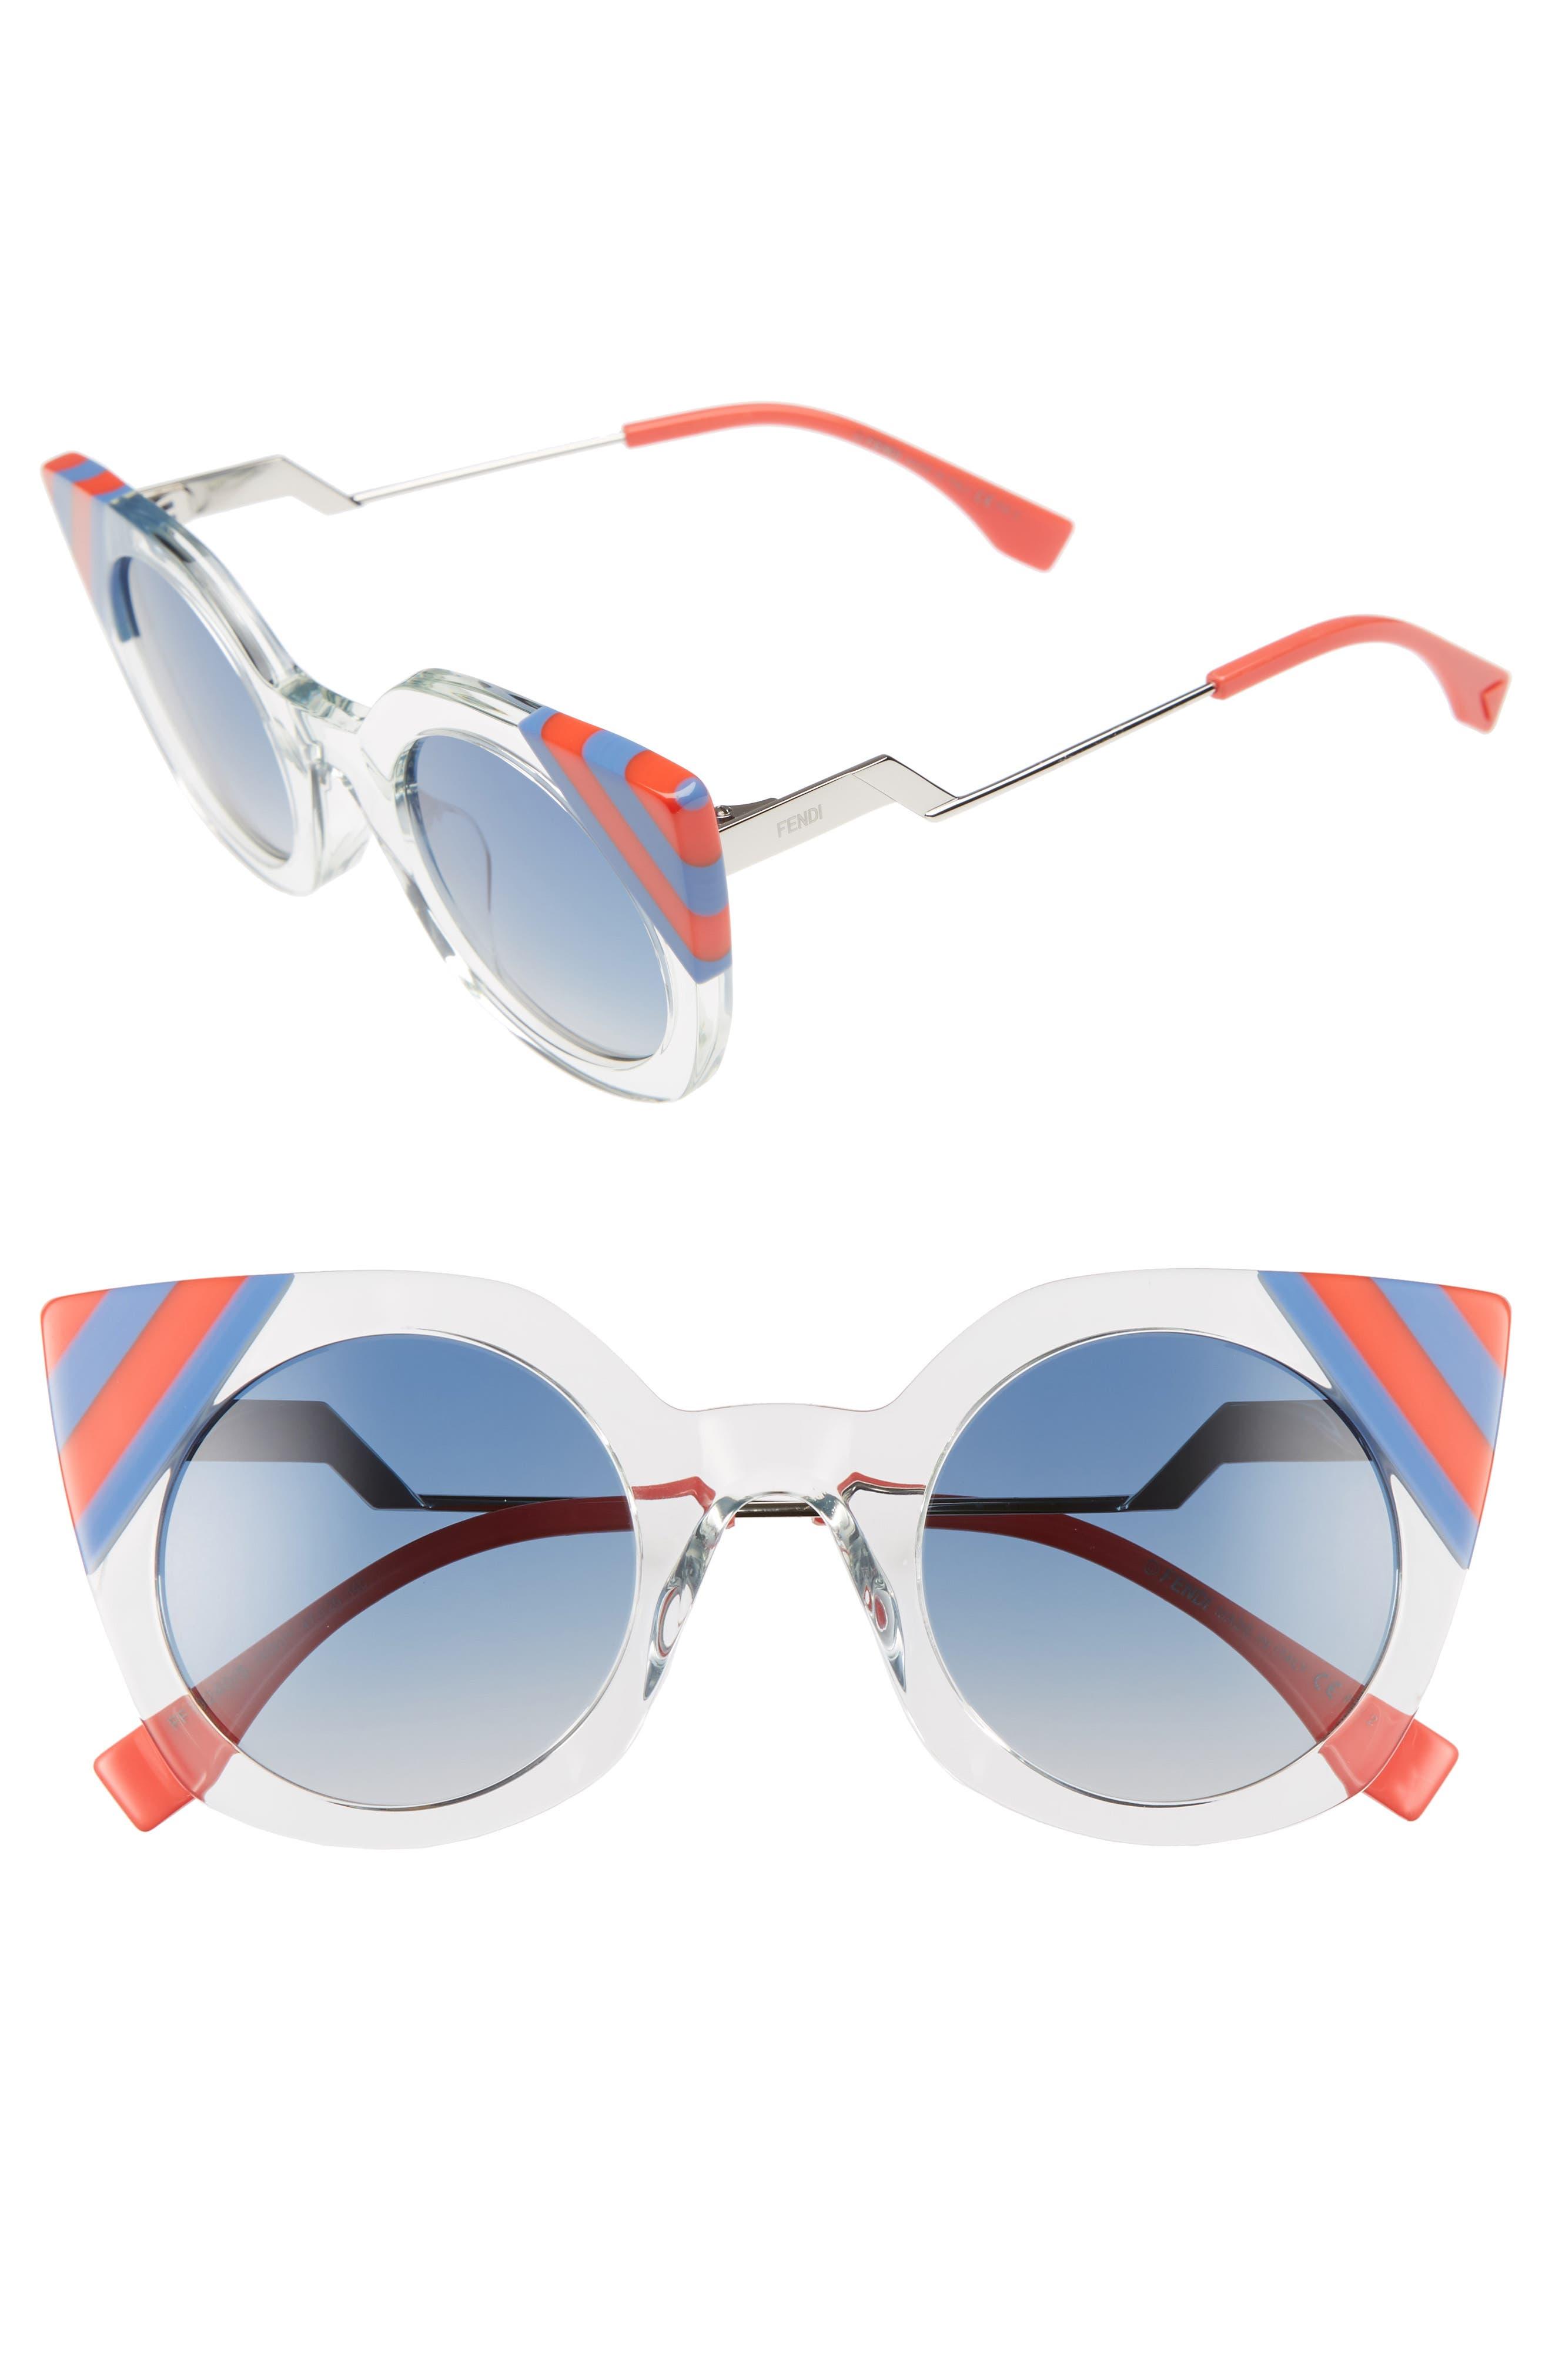 47mm Cat Eye Sunglasses,                         Main,                         color,